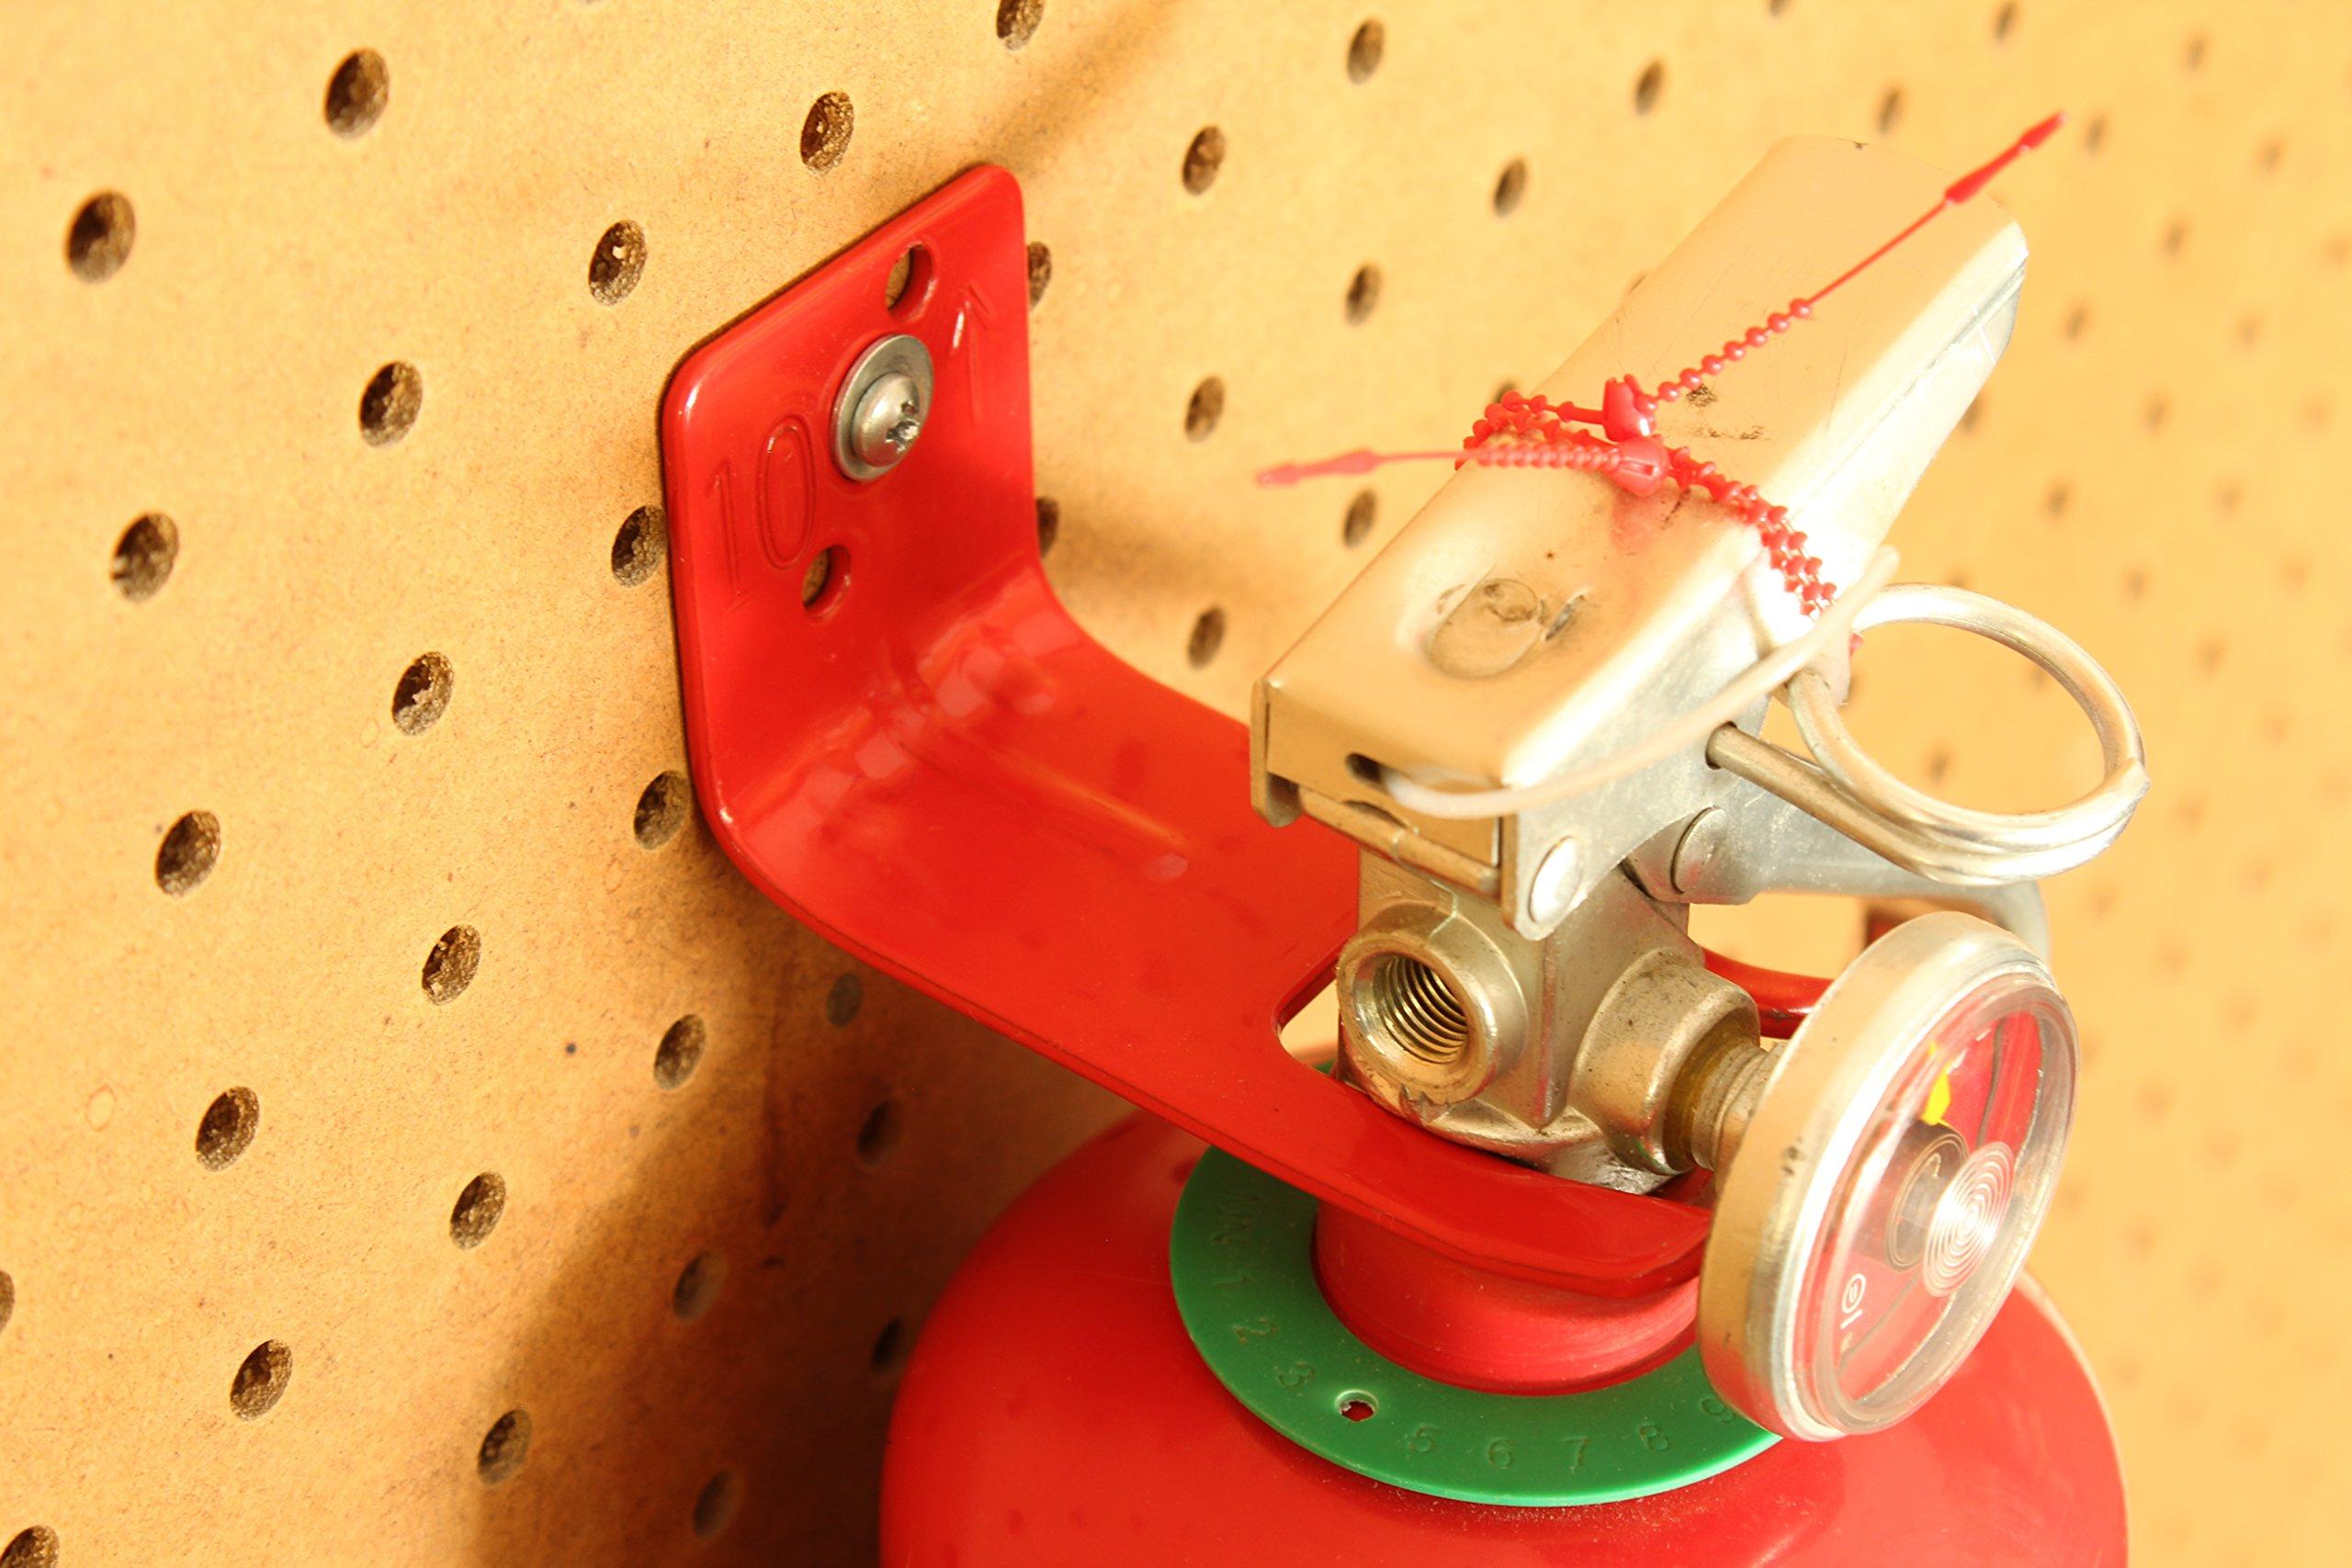 Fire Extinguisher Wall Mount - Fork Style Bracket (3, Large) by Extinguisher Experts (Image #6)